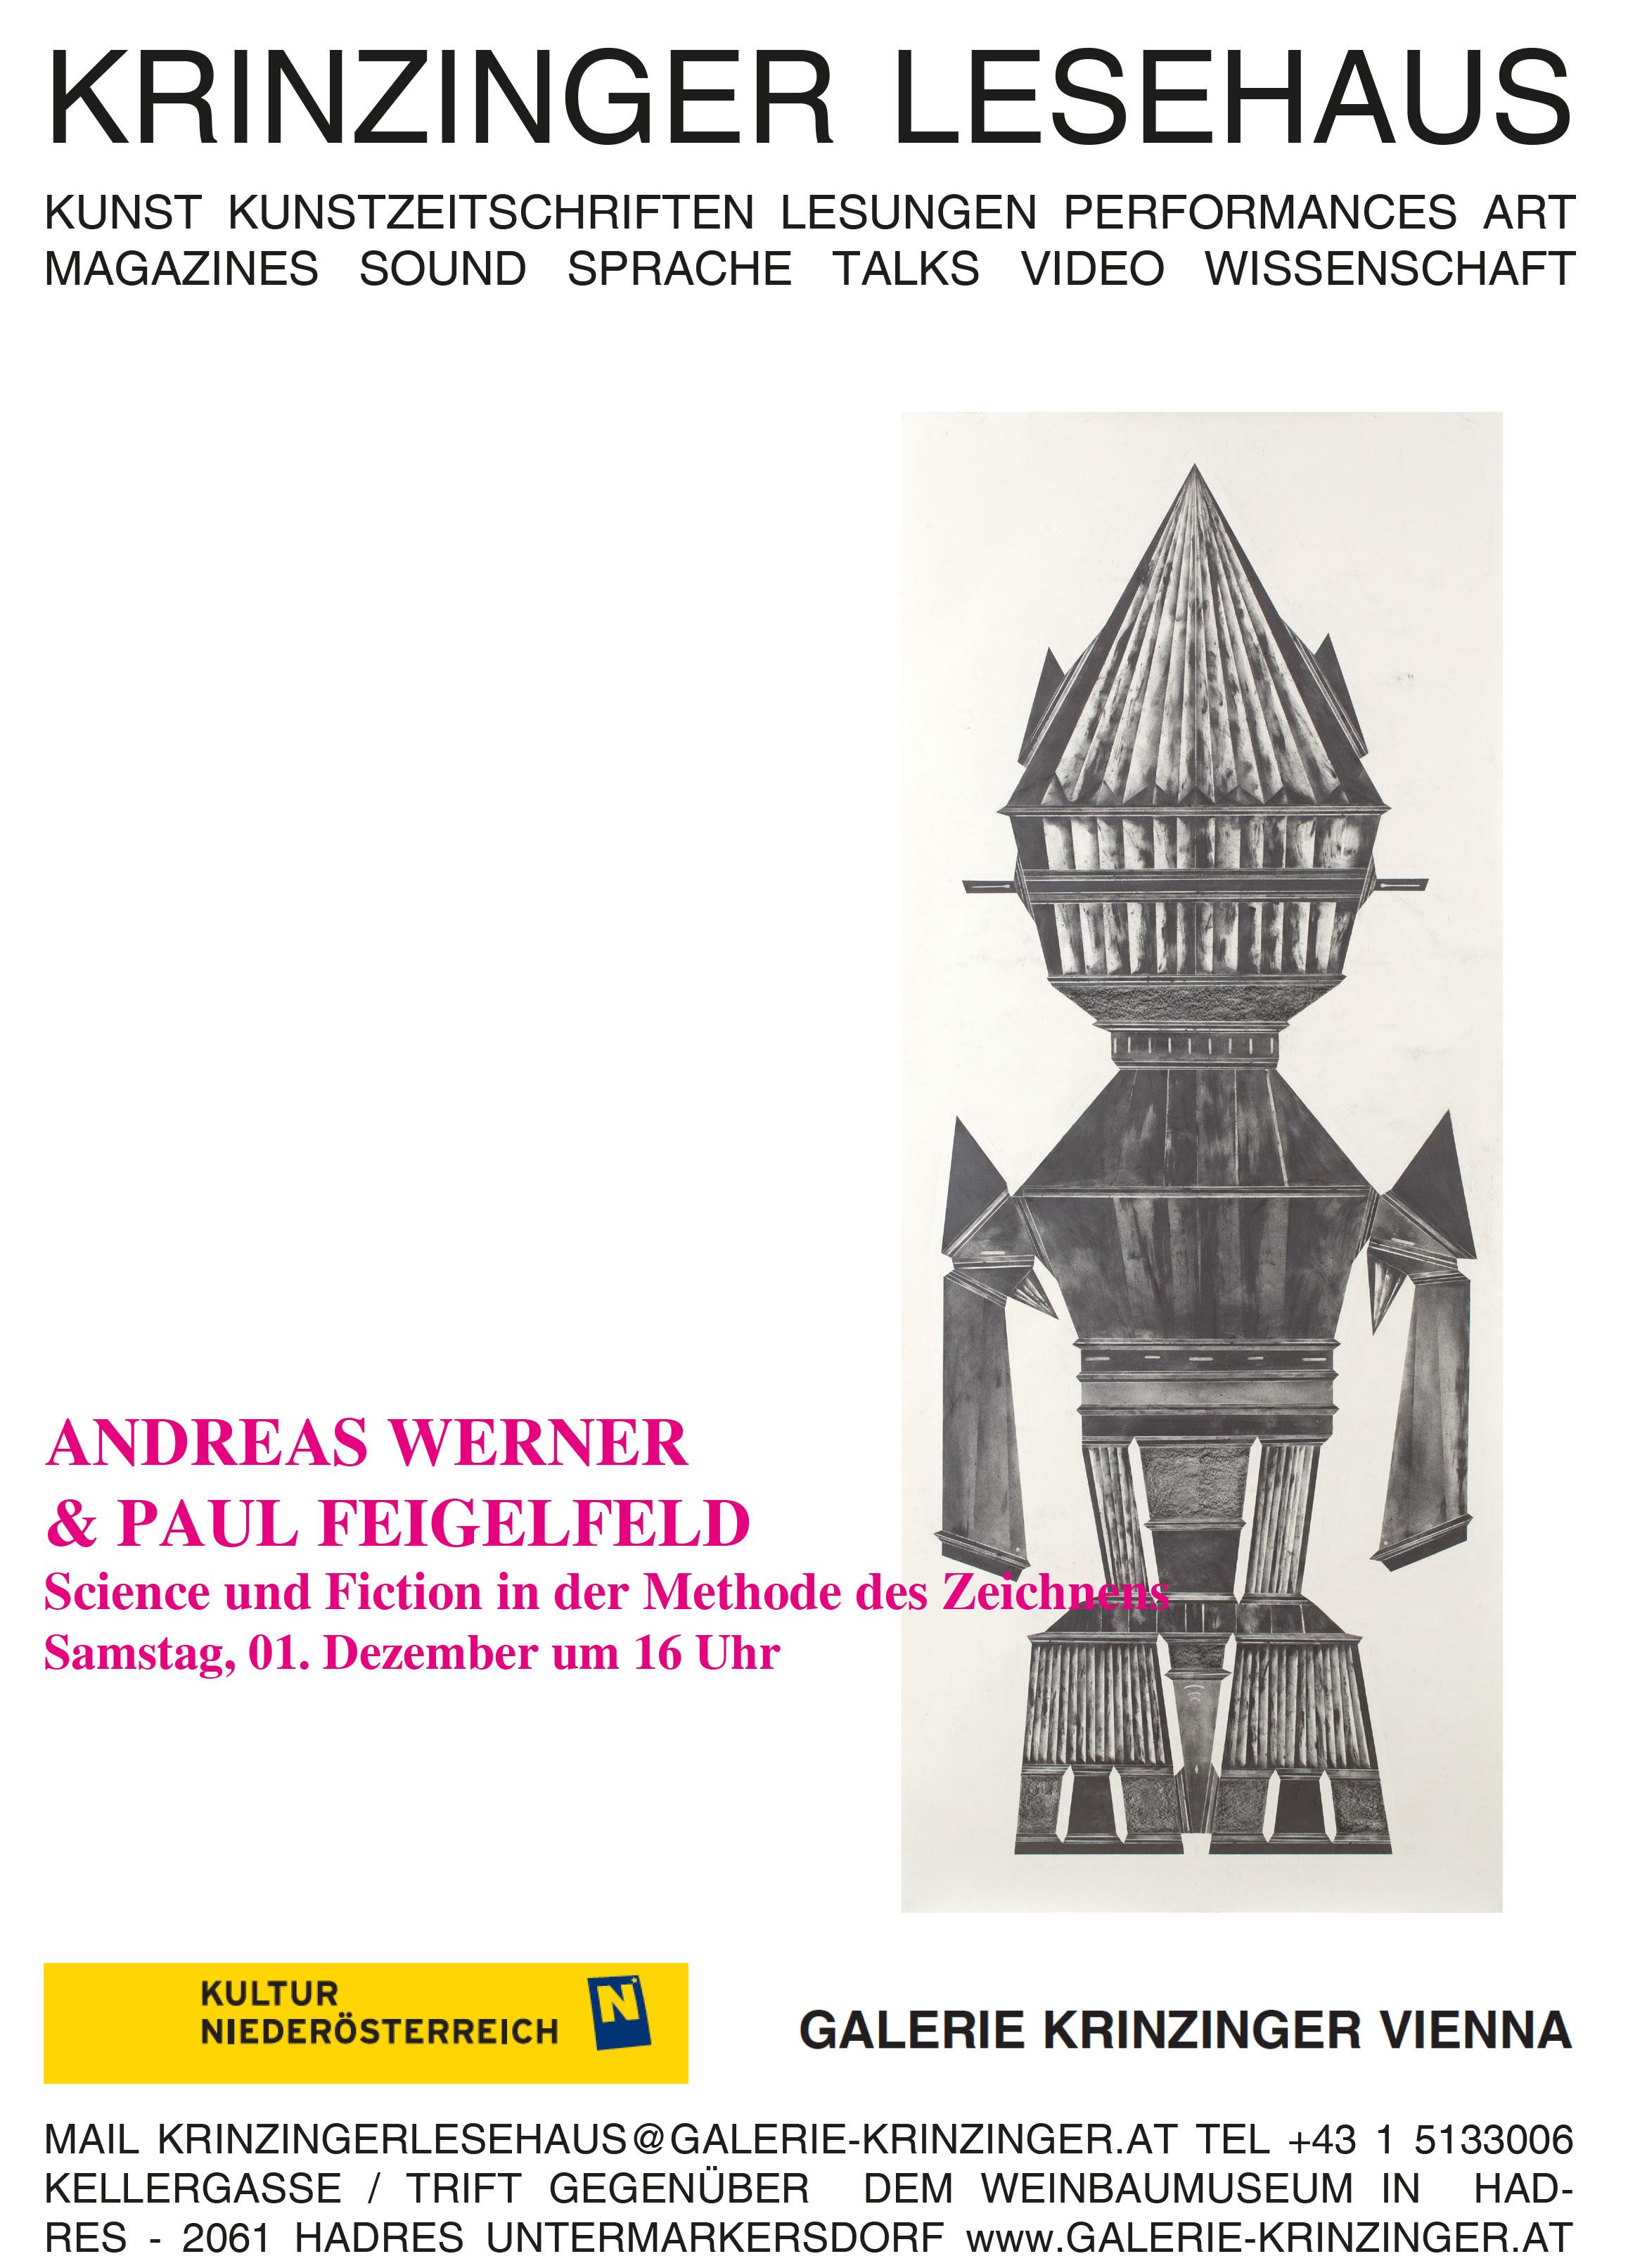 Andreas-Werner-Flyer-Krinzinger-Lesehaus-Dezember-2018---1